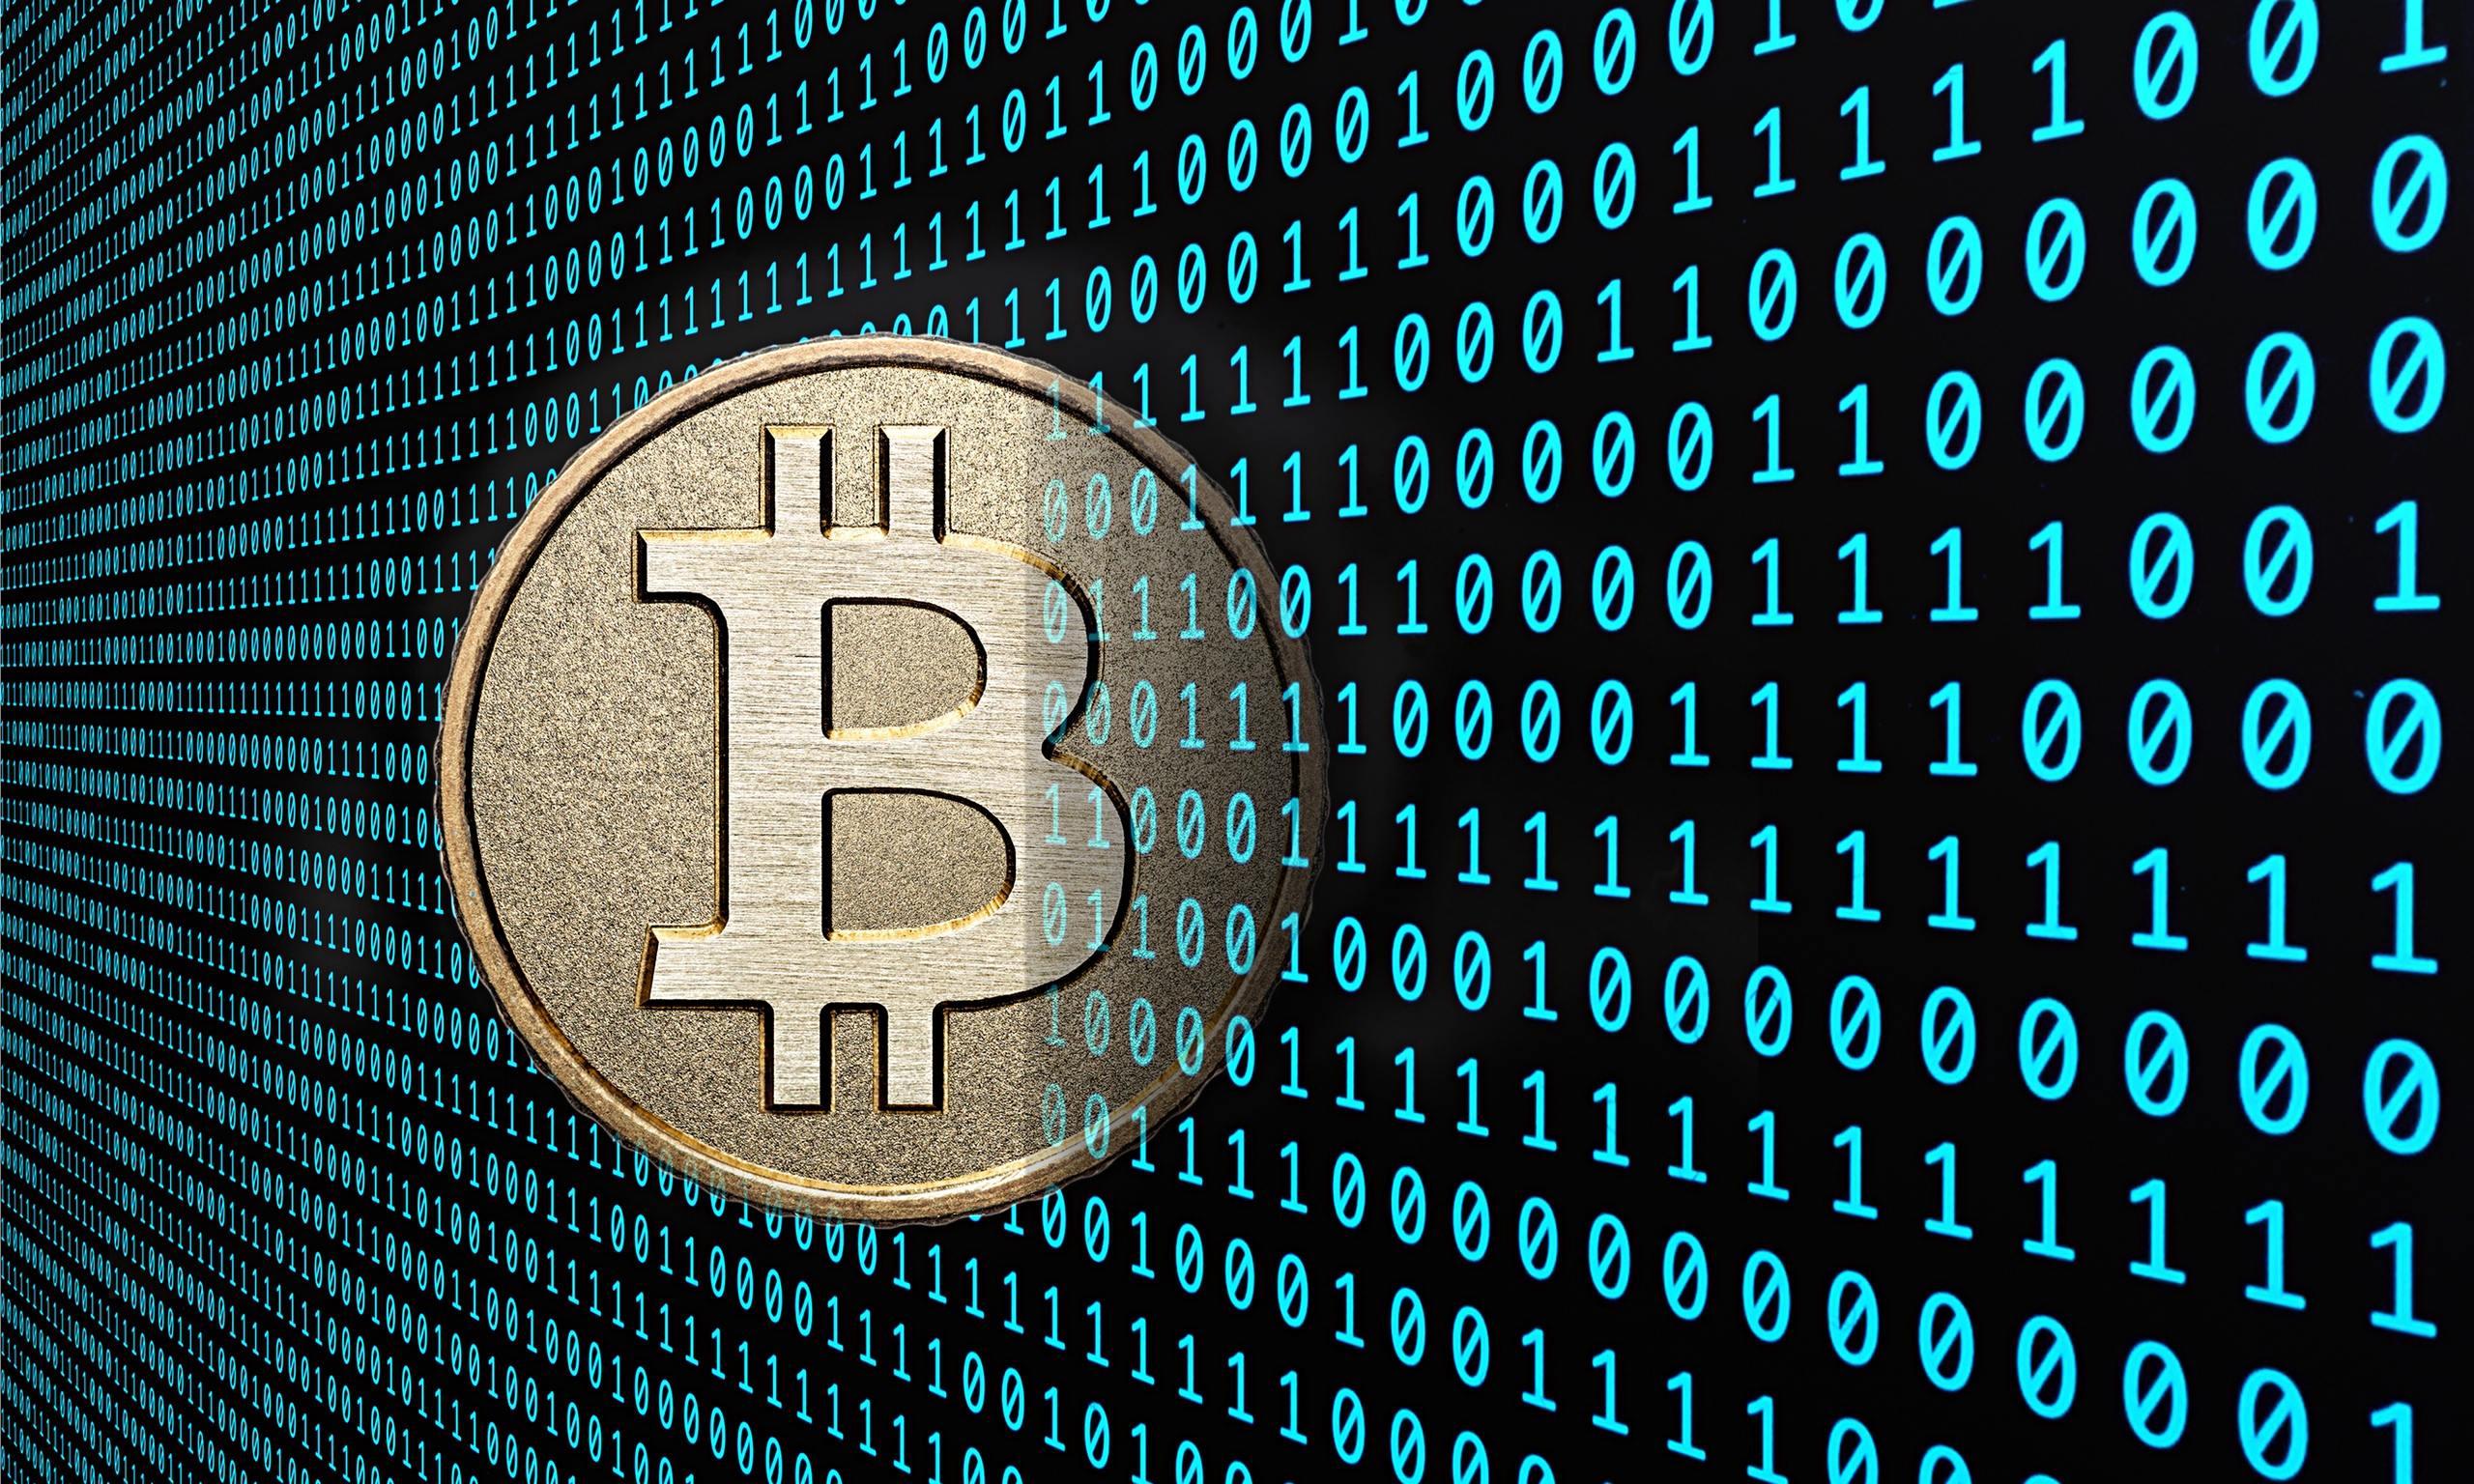 Rezultat slika za Bitcoin image full hd